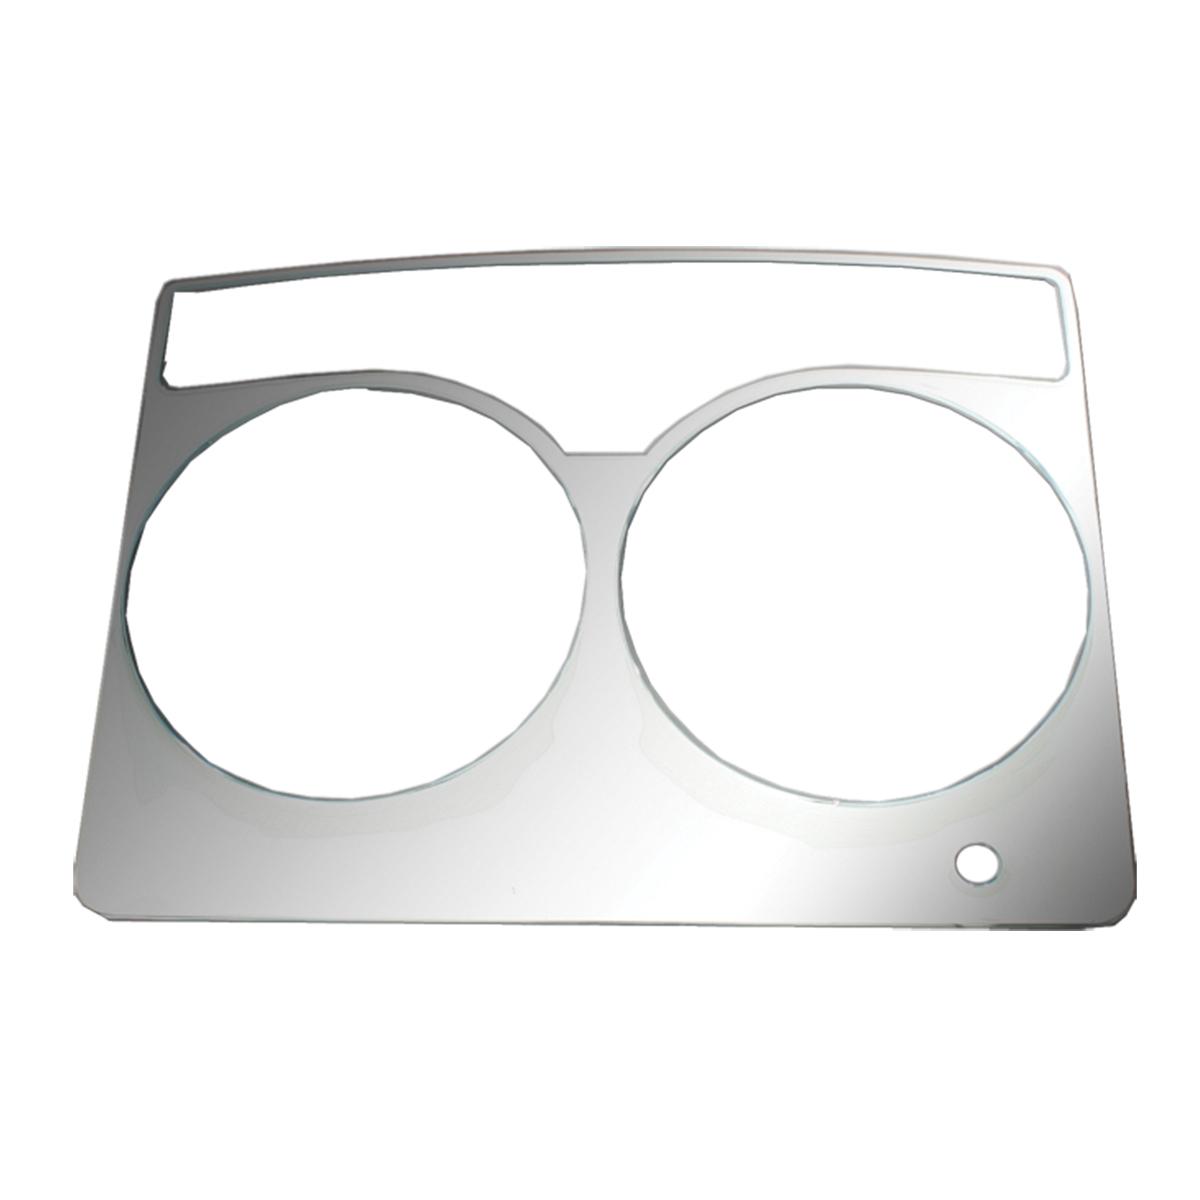 68911 KW Chrome Soft Plastic Speedometer Gauge Trim